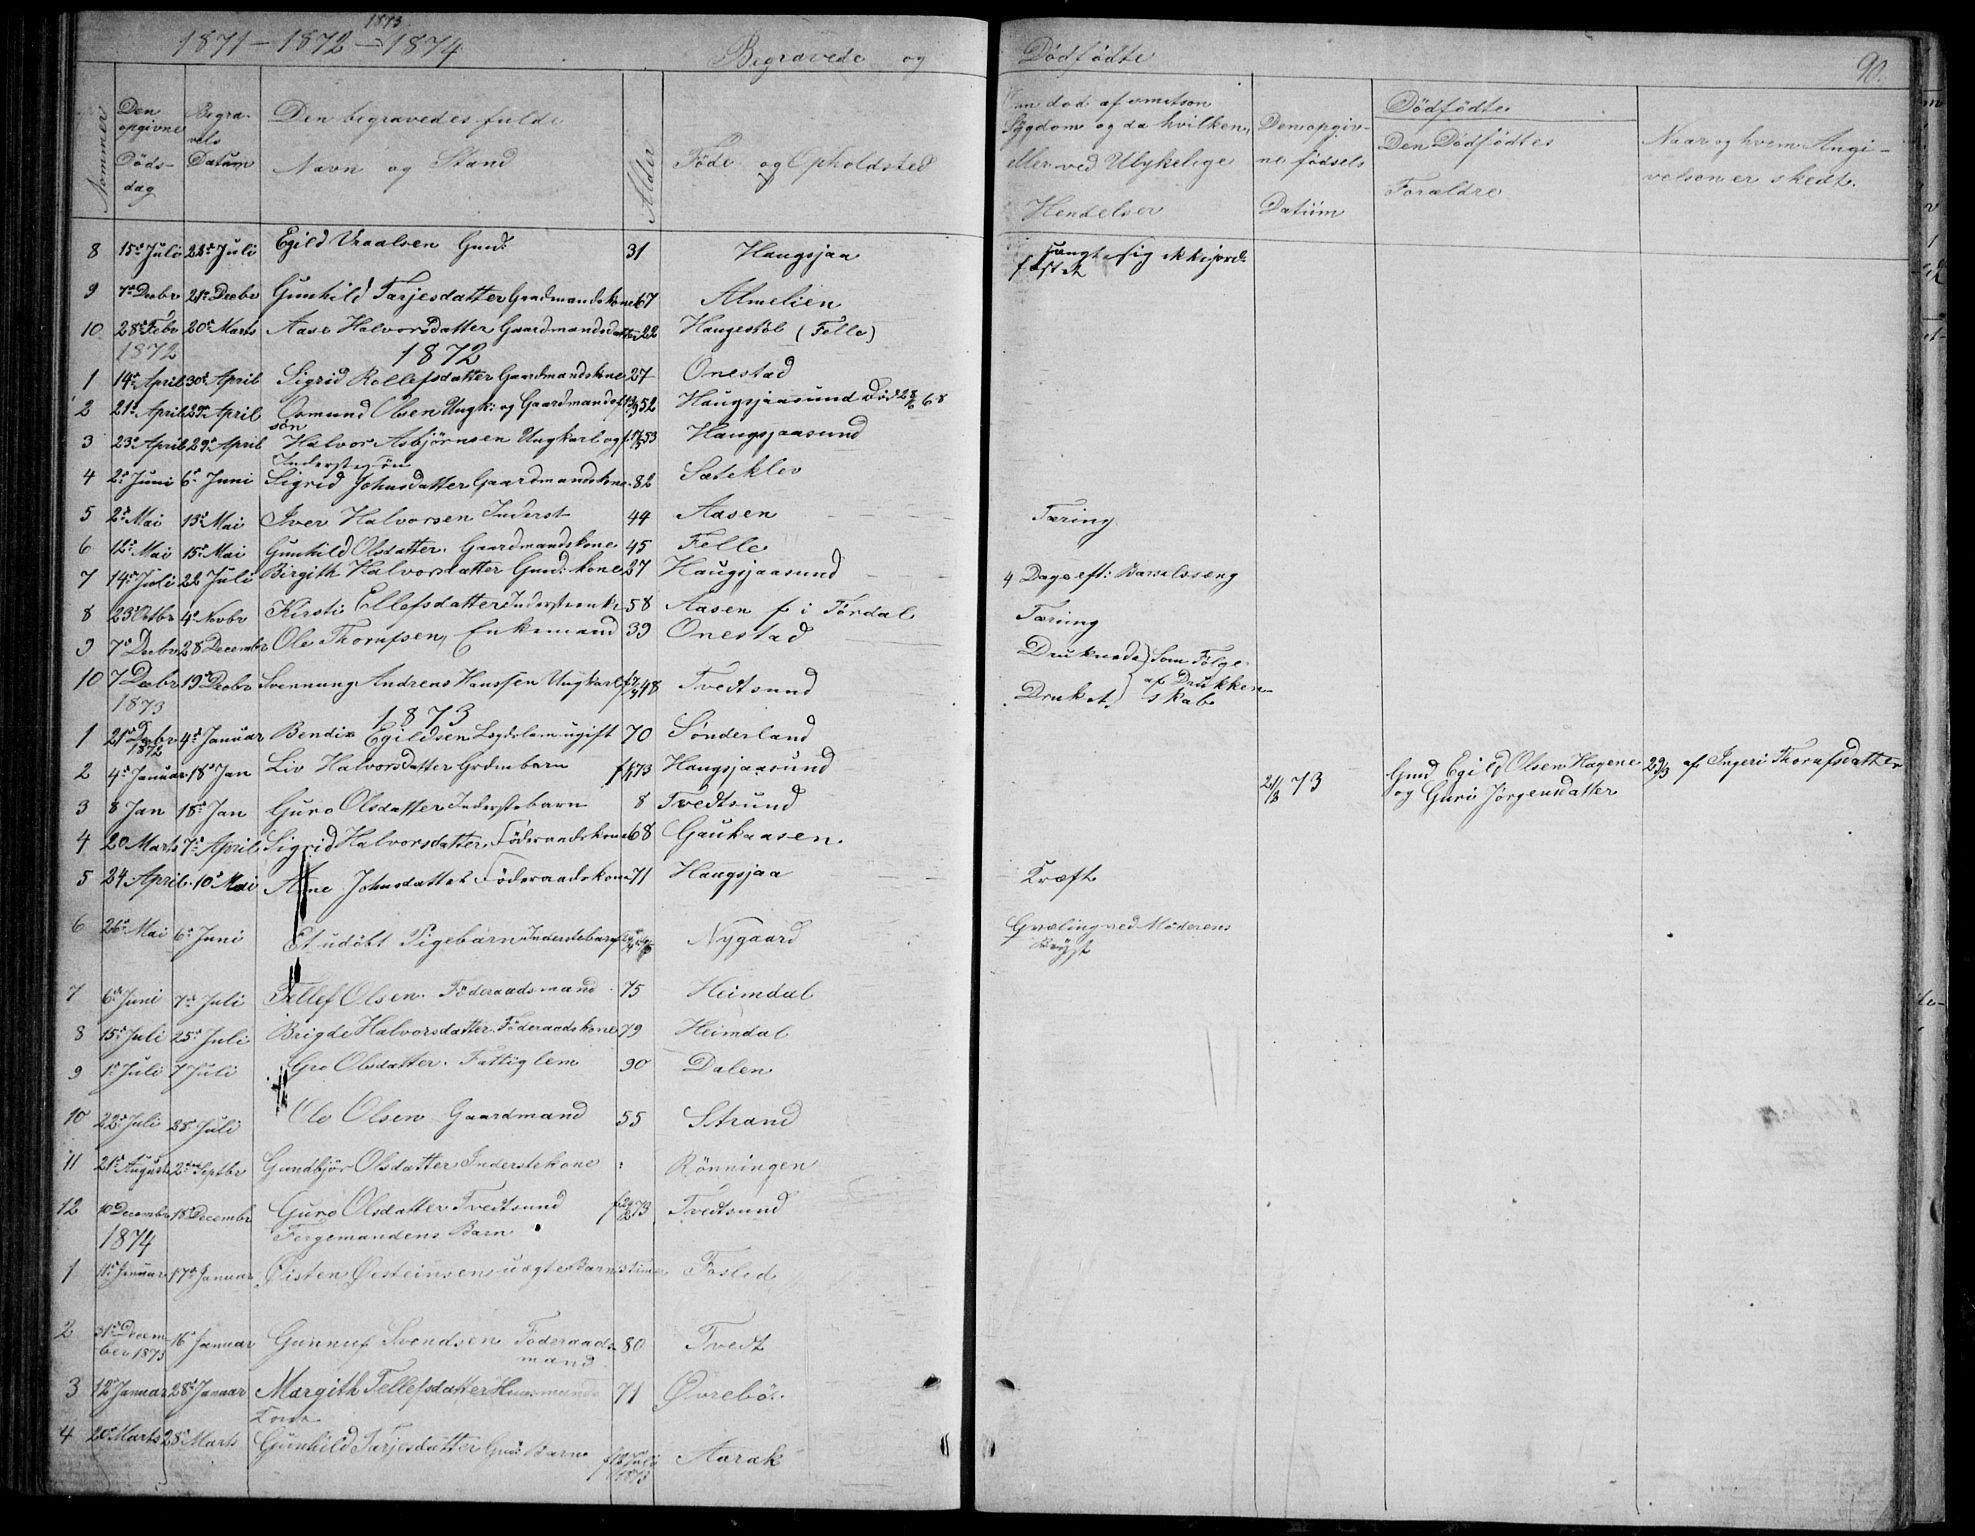 SAKO, Nissedal kirkebøker, G/Gb/L0002: Klokkerbok nr. II 2, 1863-1892, s. 90